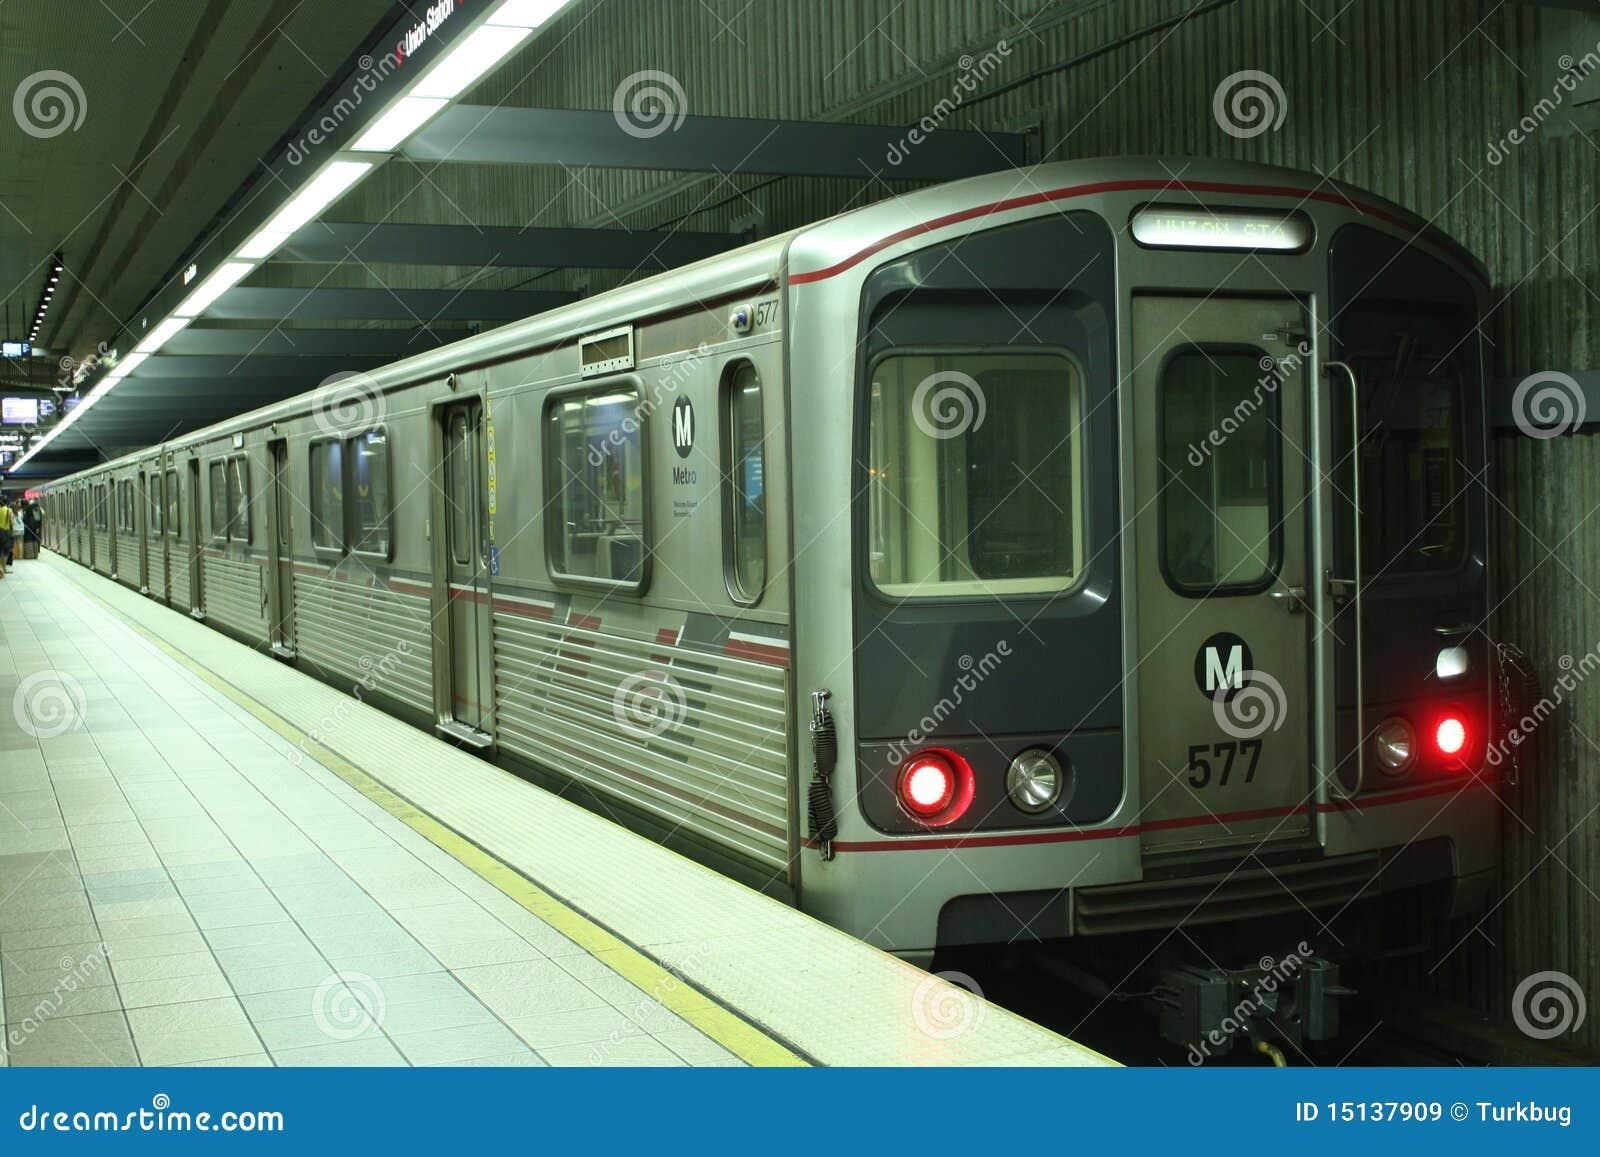 Metro Red line subway train